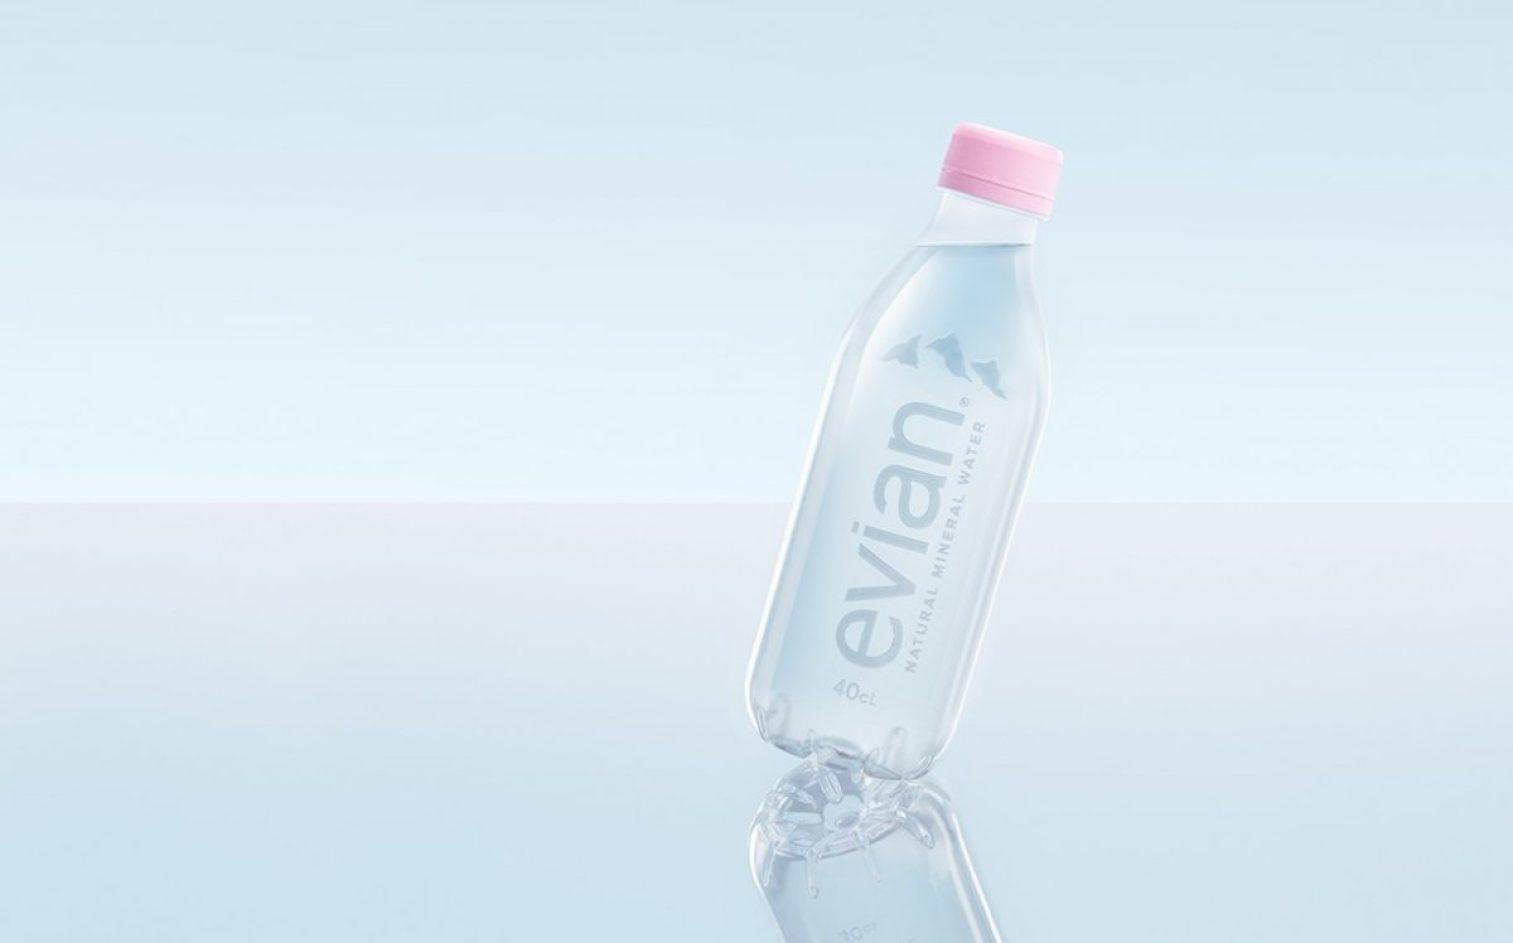 Evian Label Free Bottle